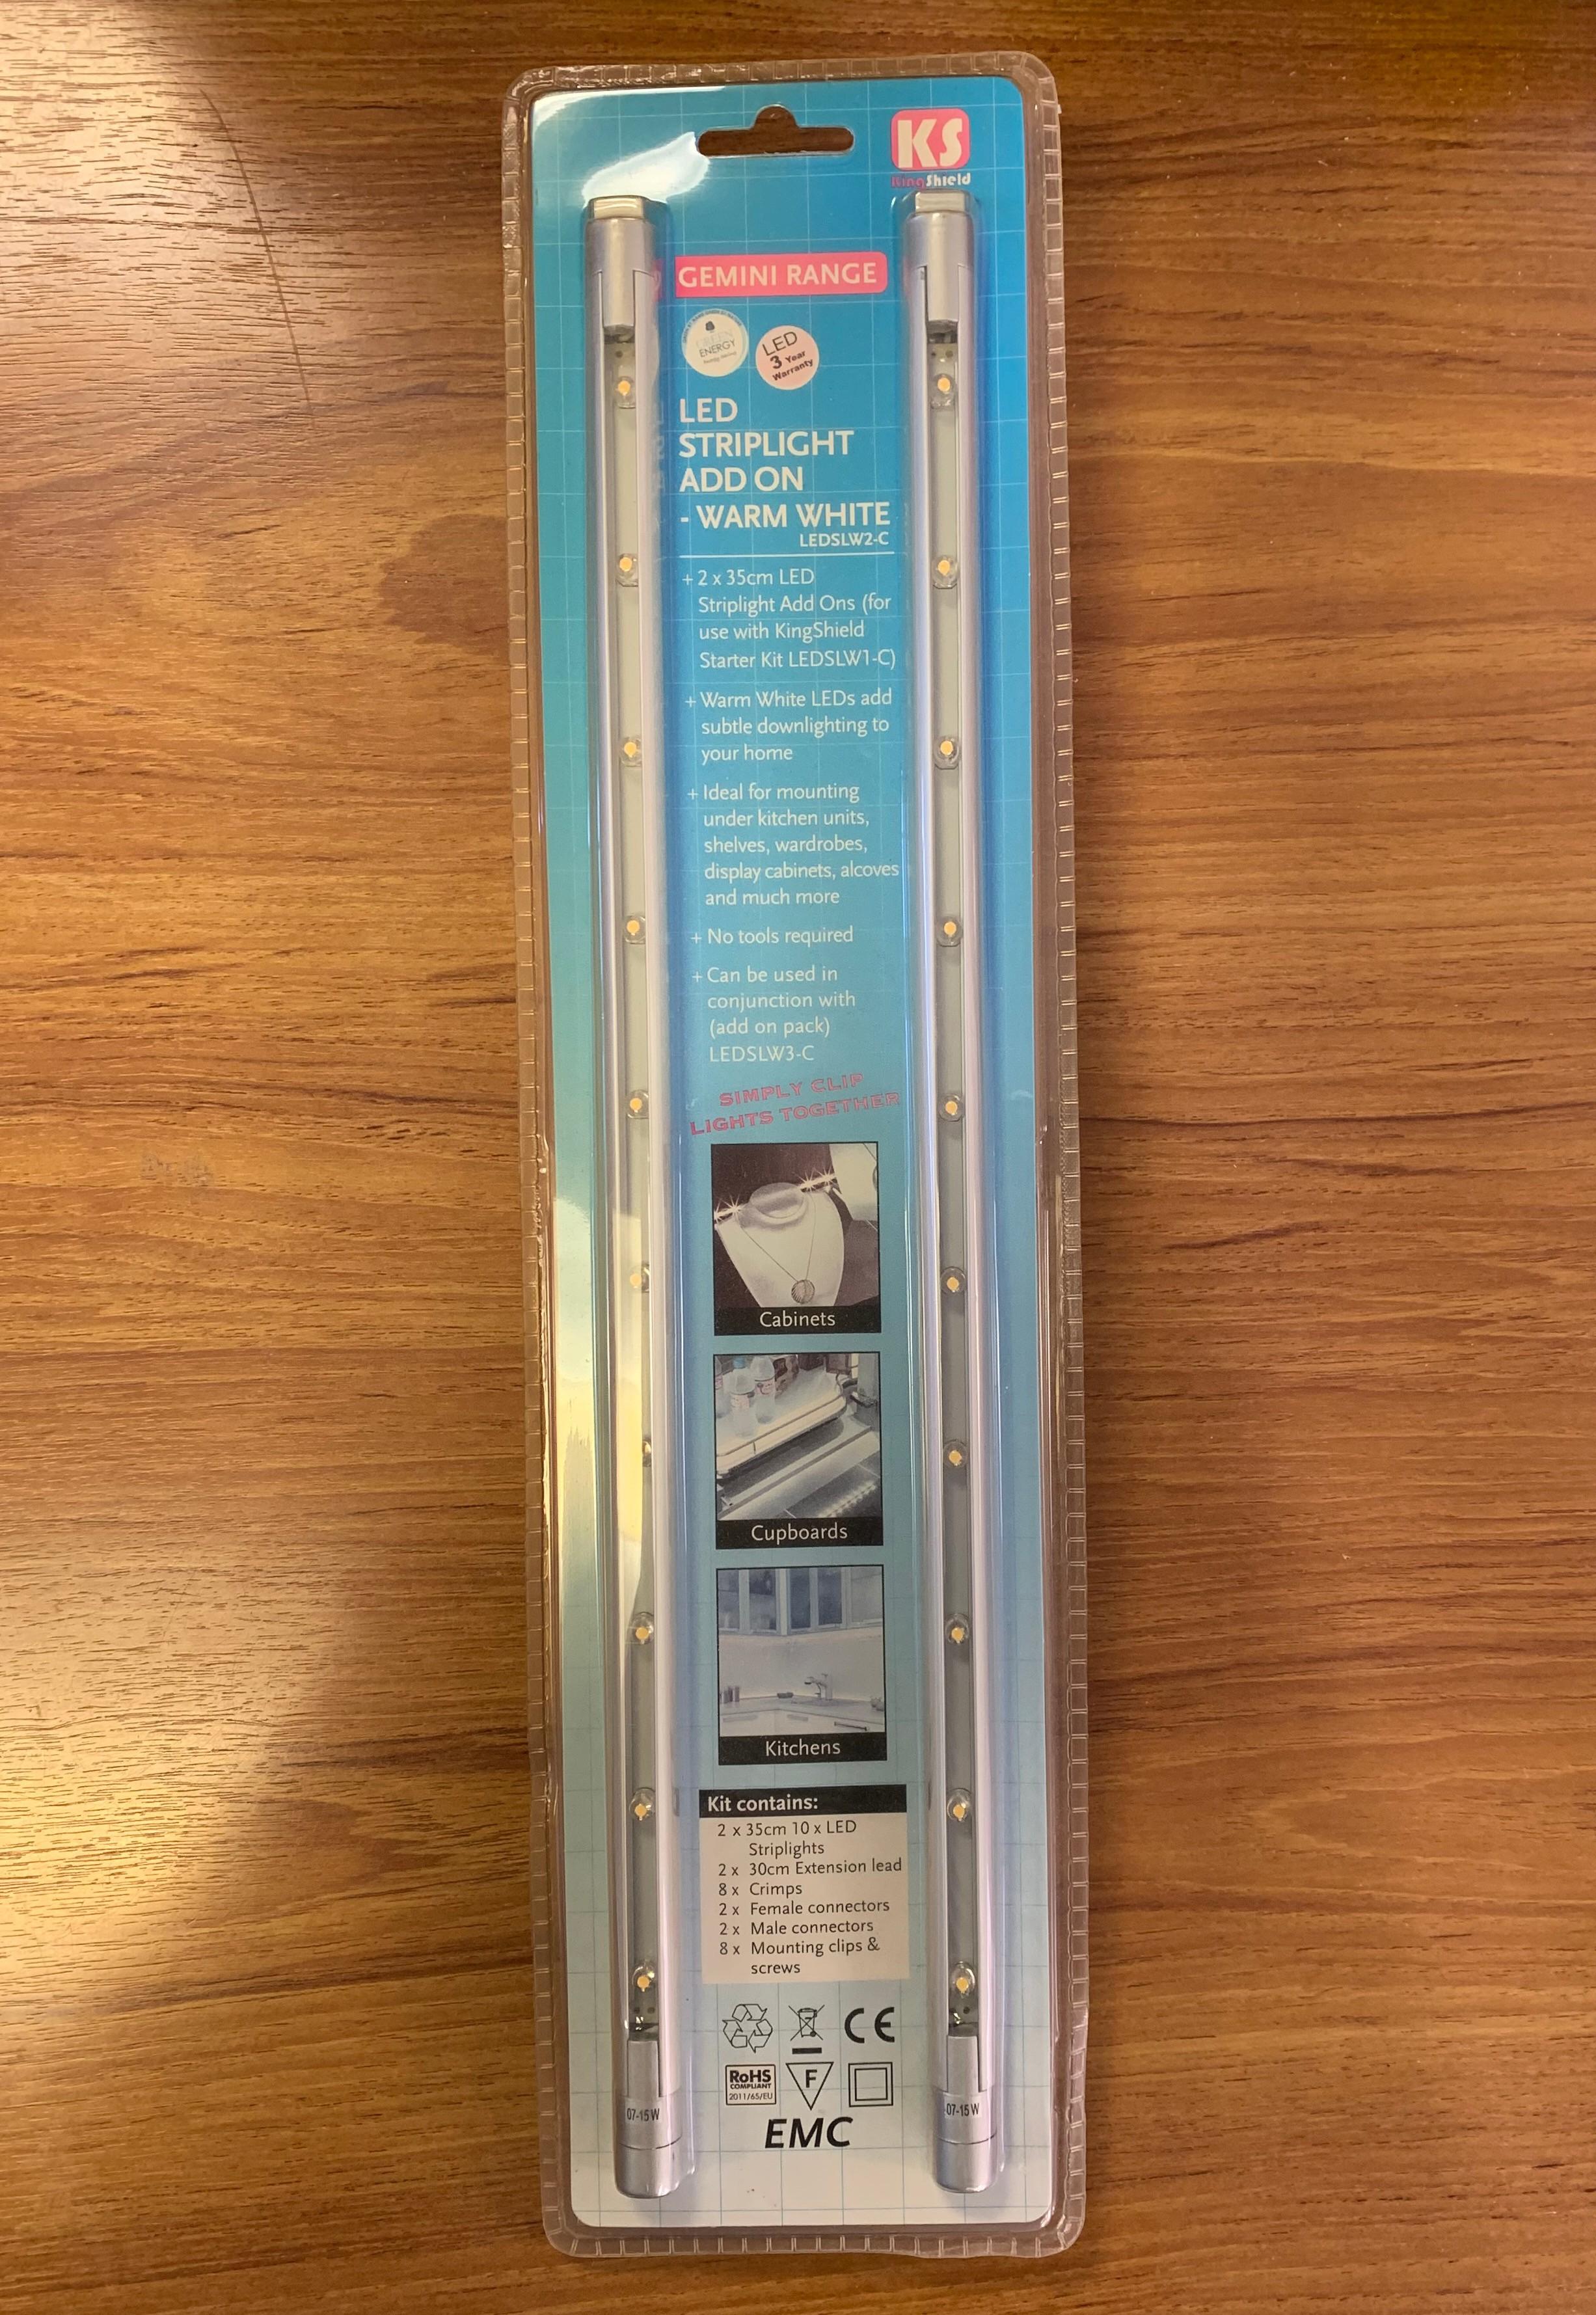 GreenBrook KingShield LEDSLW2-C LED Striplight Add On- Warm White - Buy online or in store from John Cribb & Sons Ltd